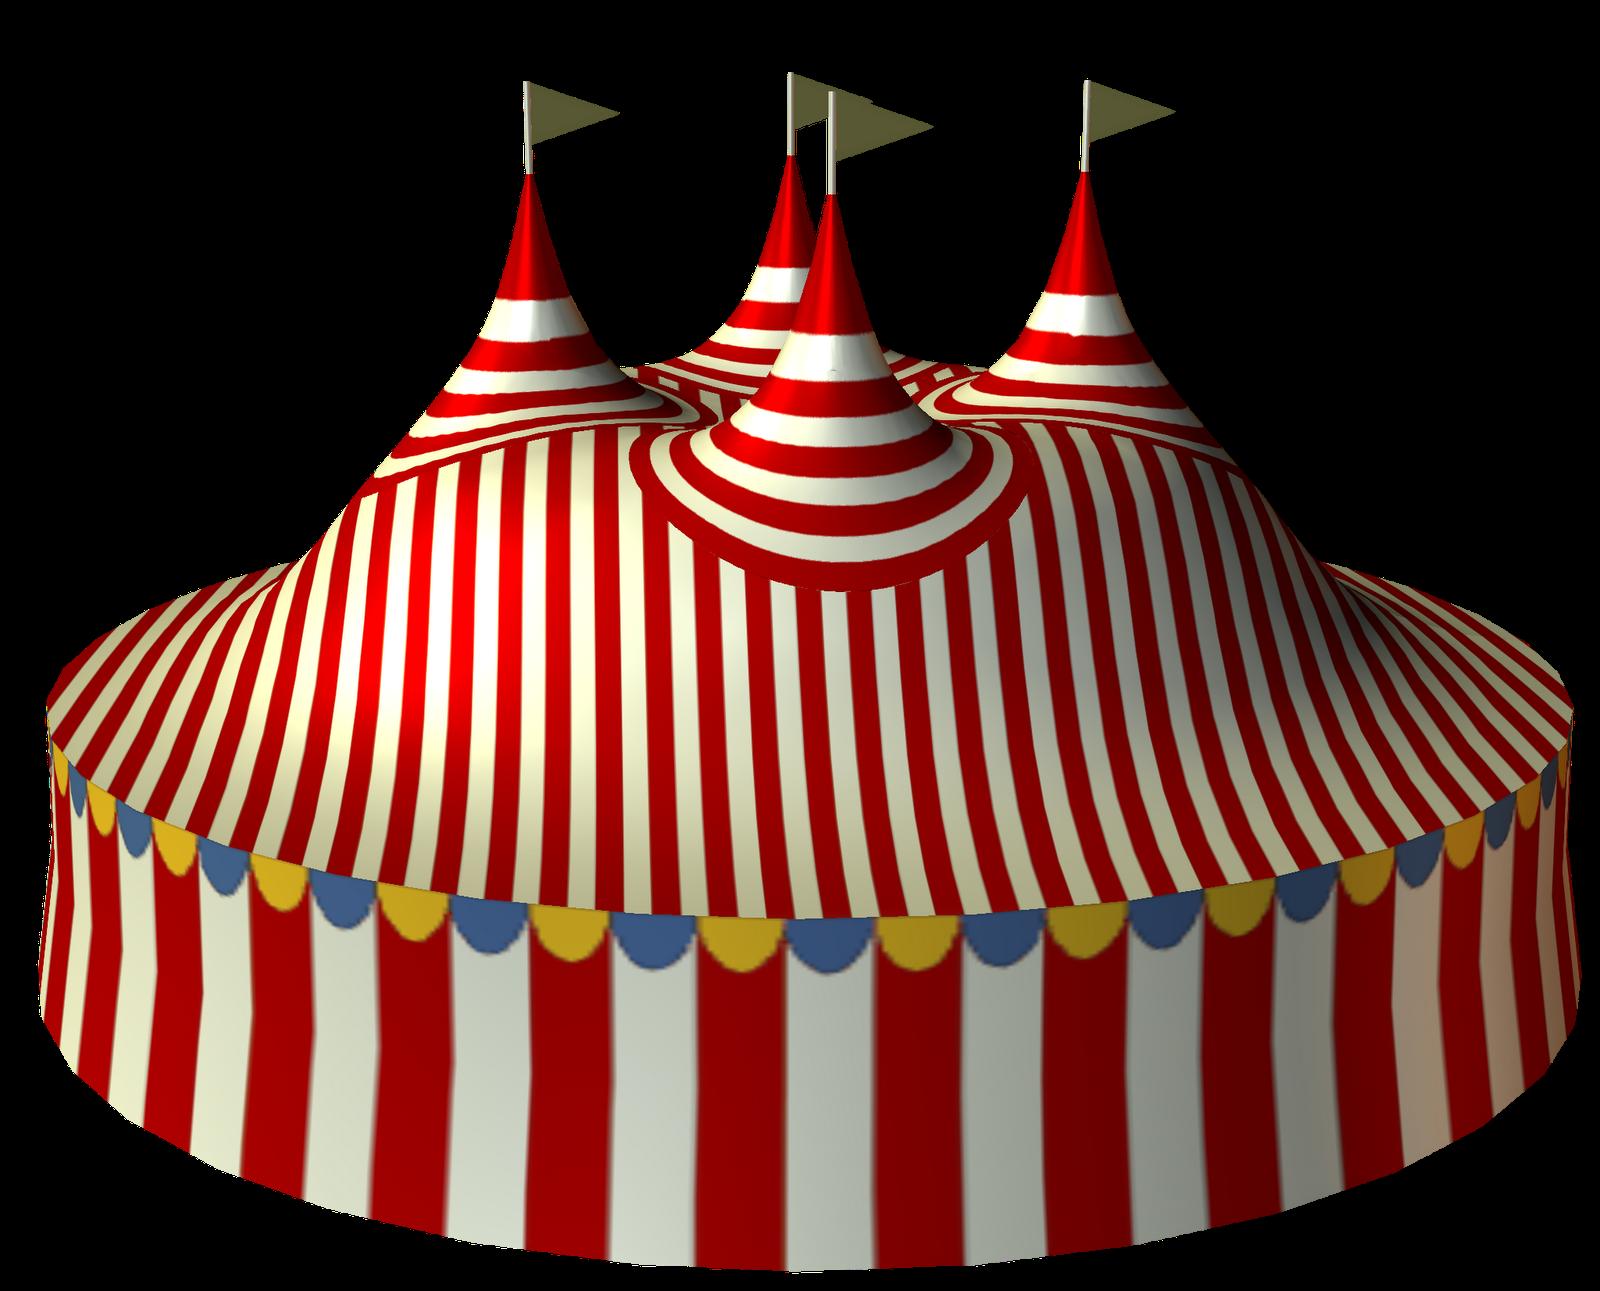 circus graphics high resolution png